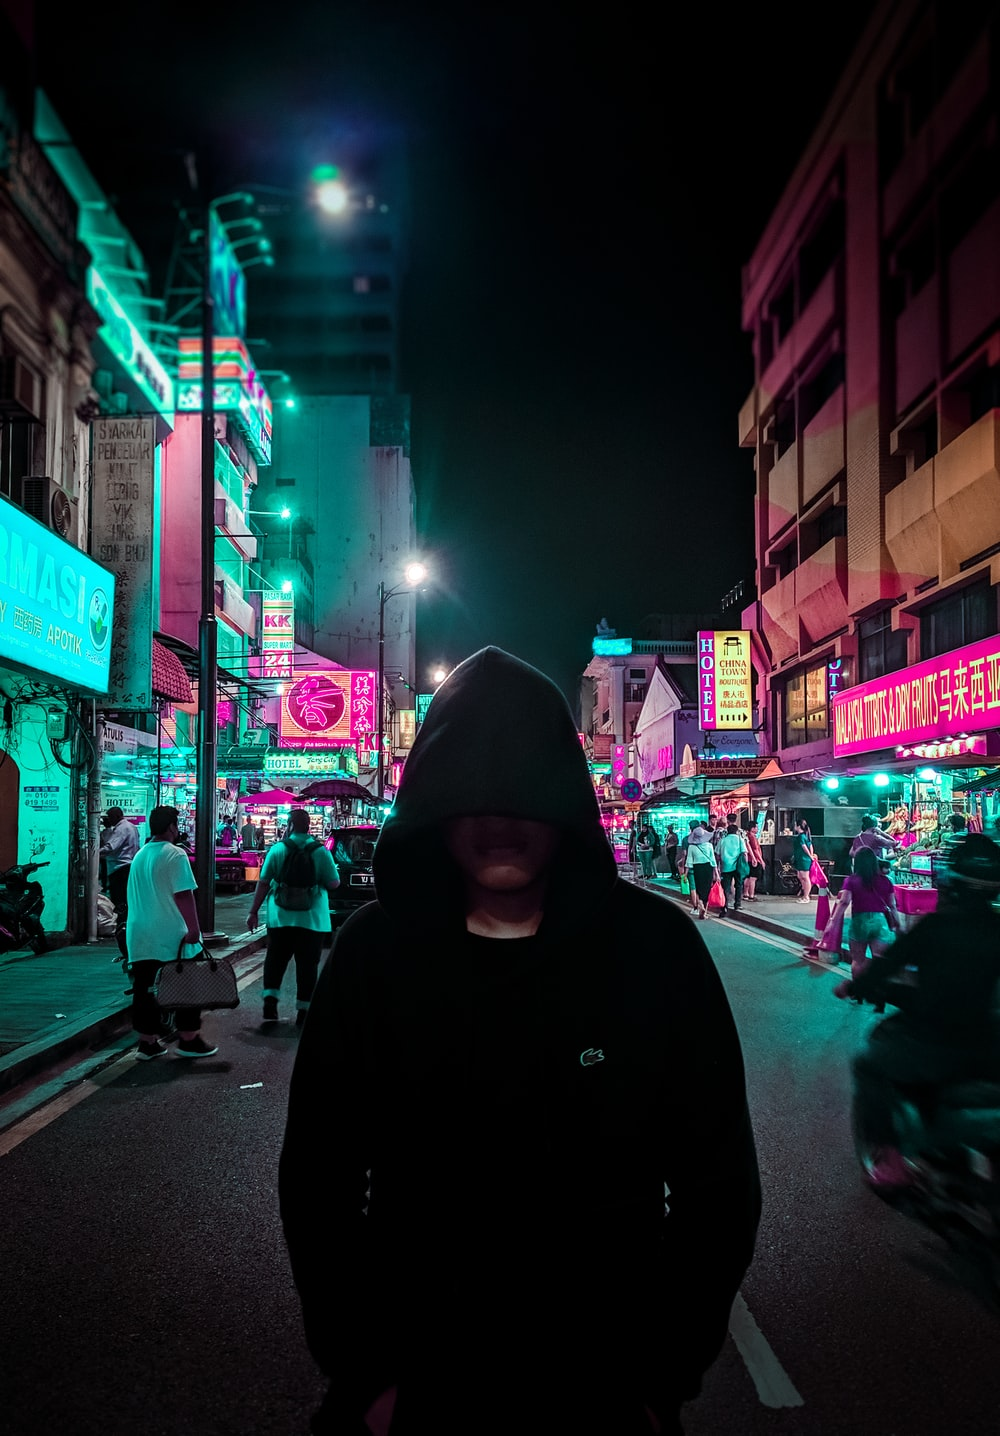 man in black hoodie walking on street during night time